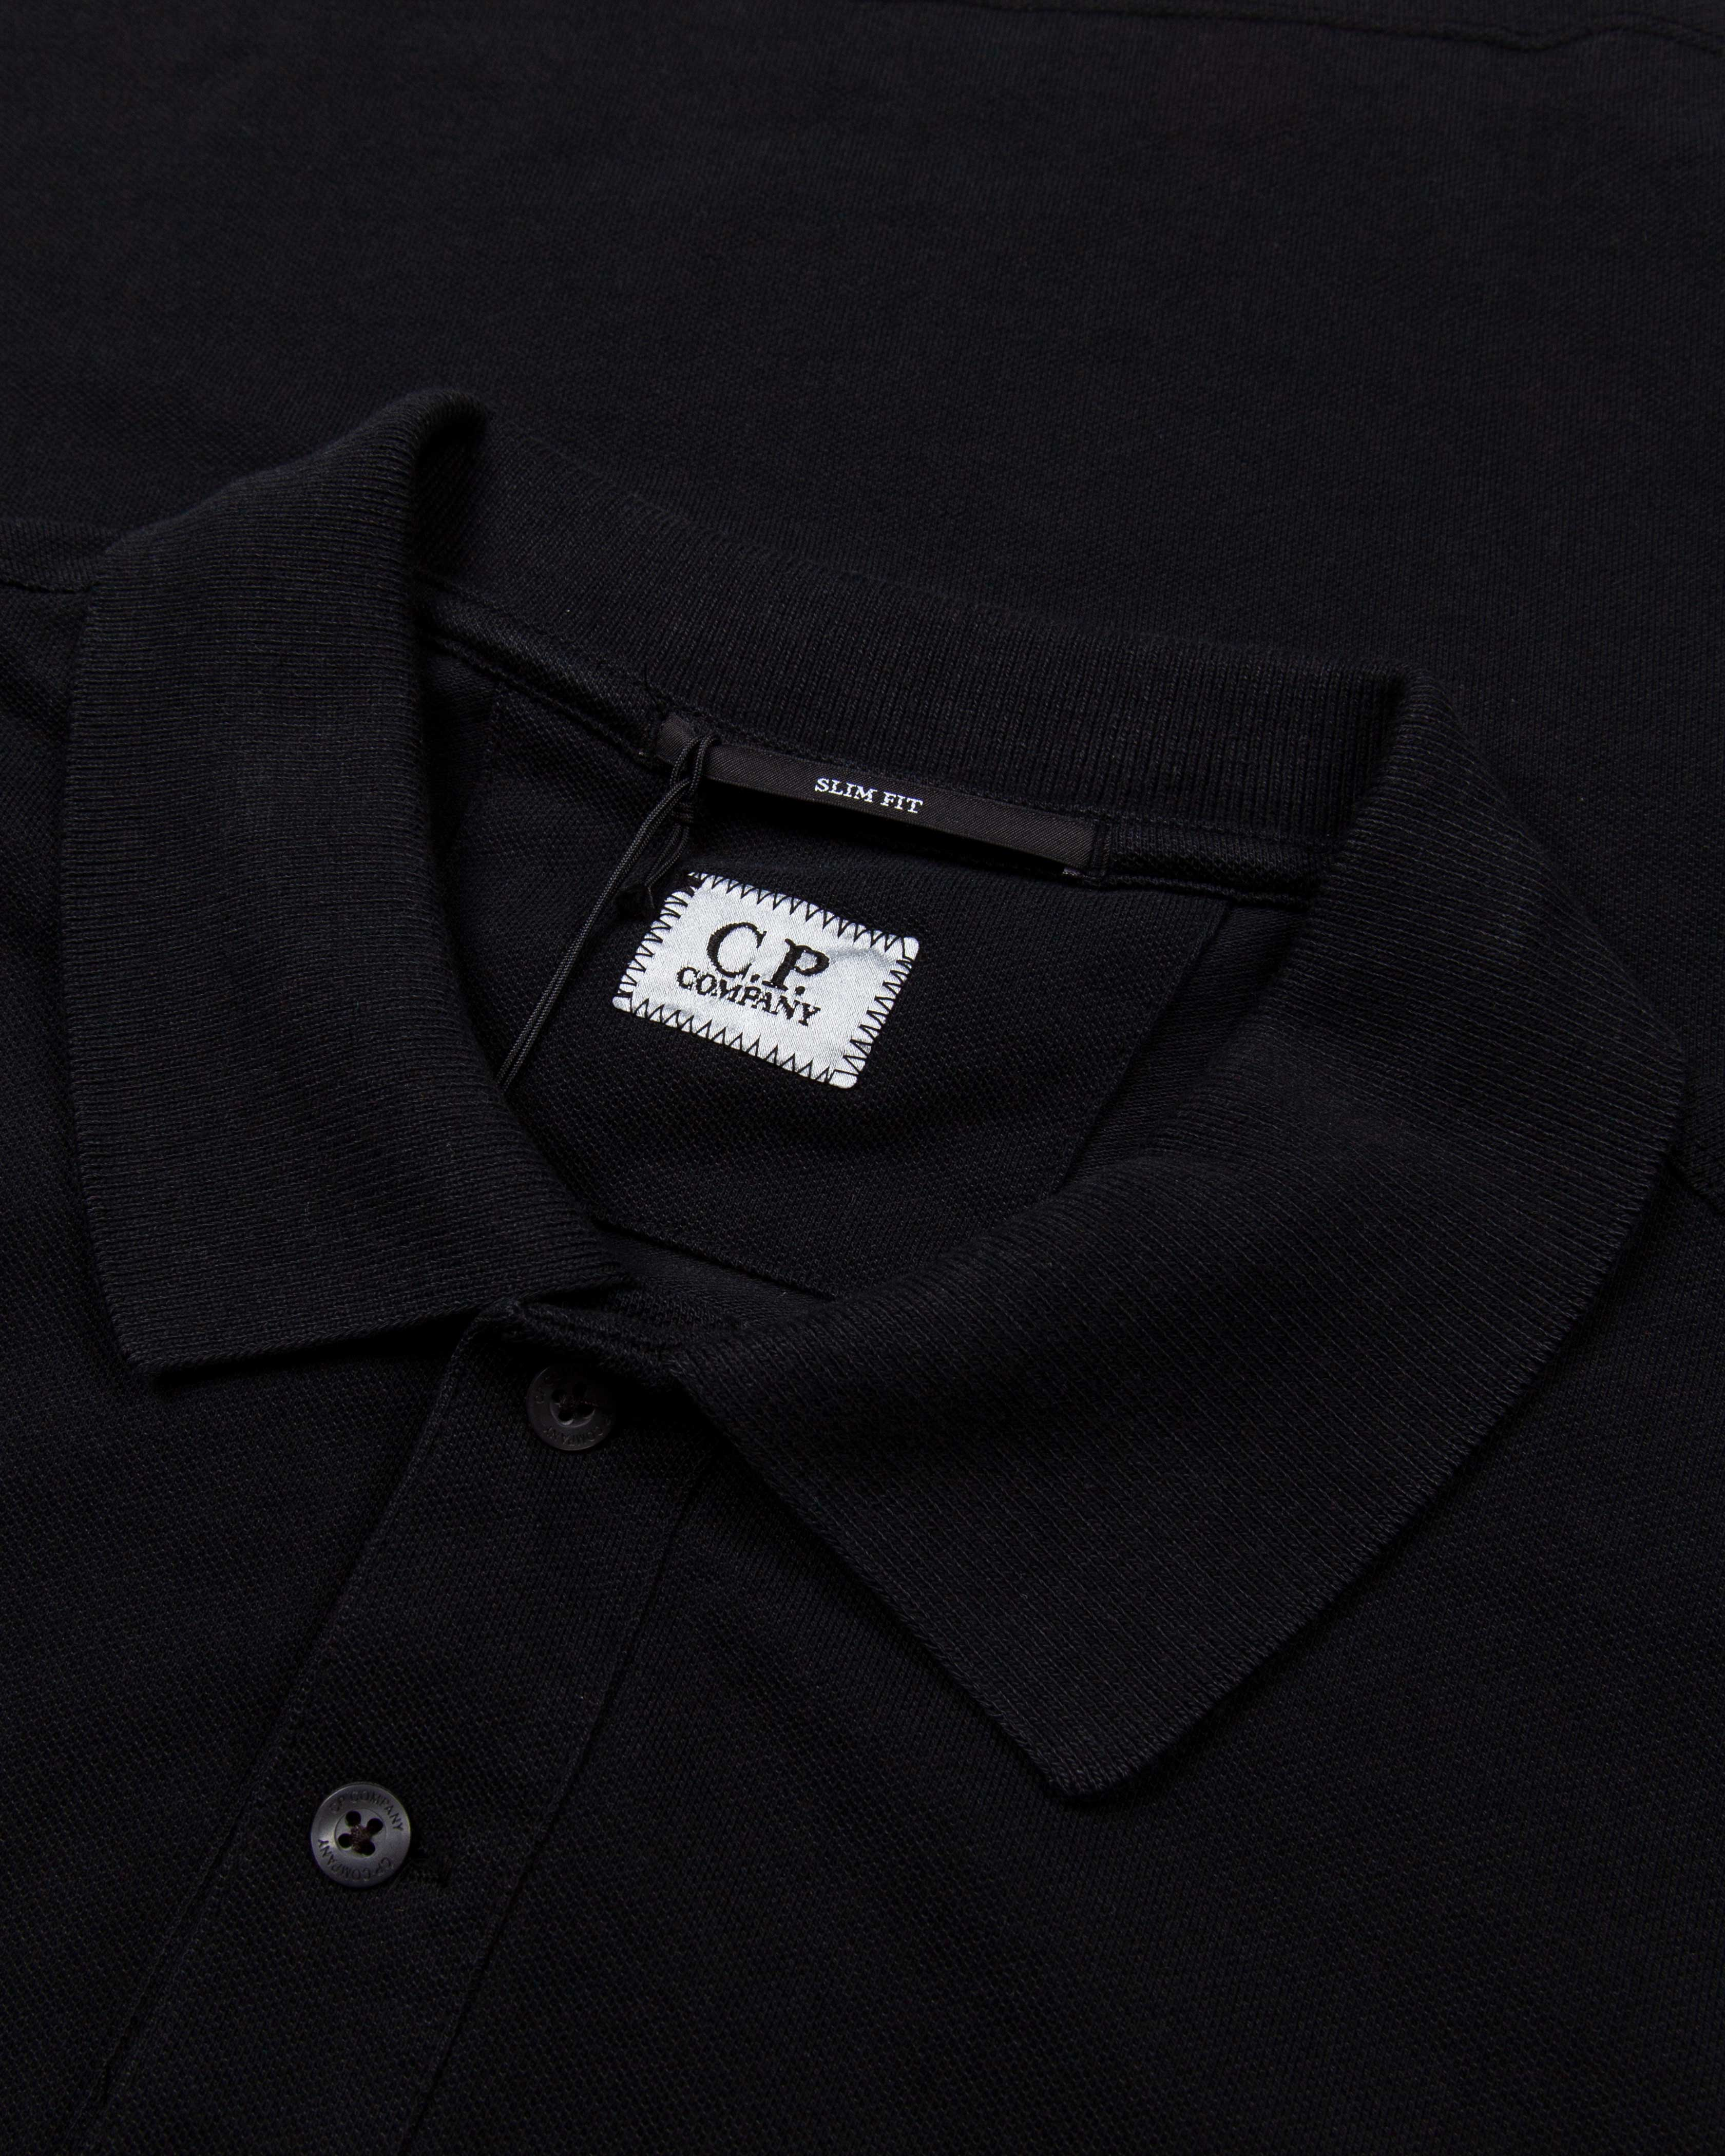 C.P.COMPANY STRETCH PIQUET POLO SHIRT IN BLACK